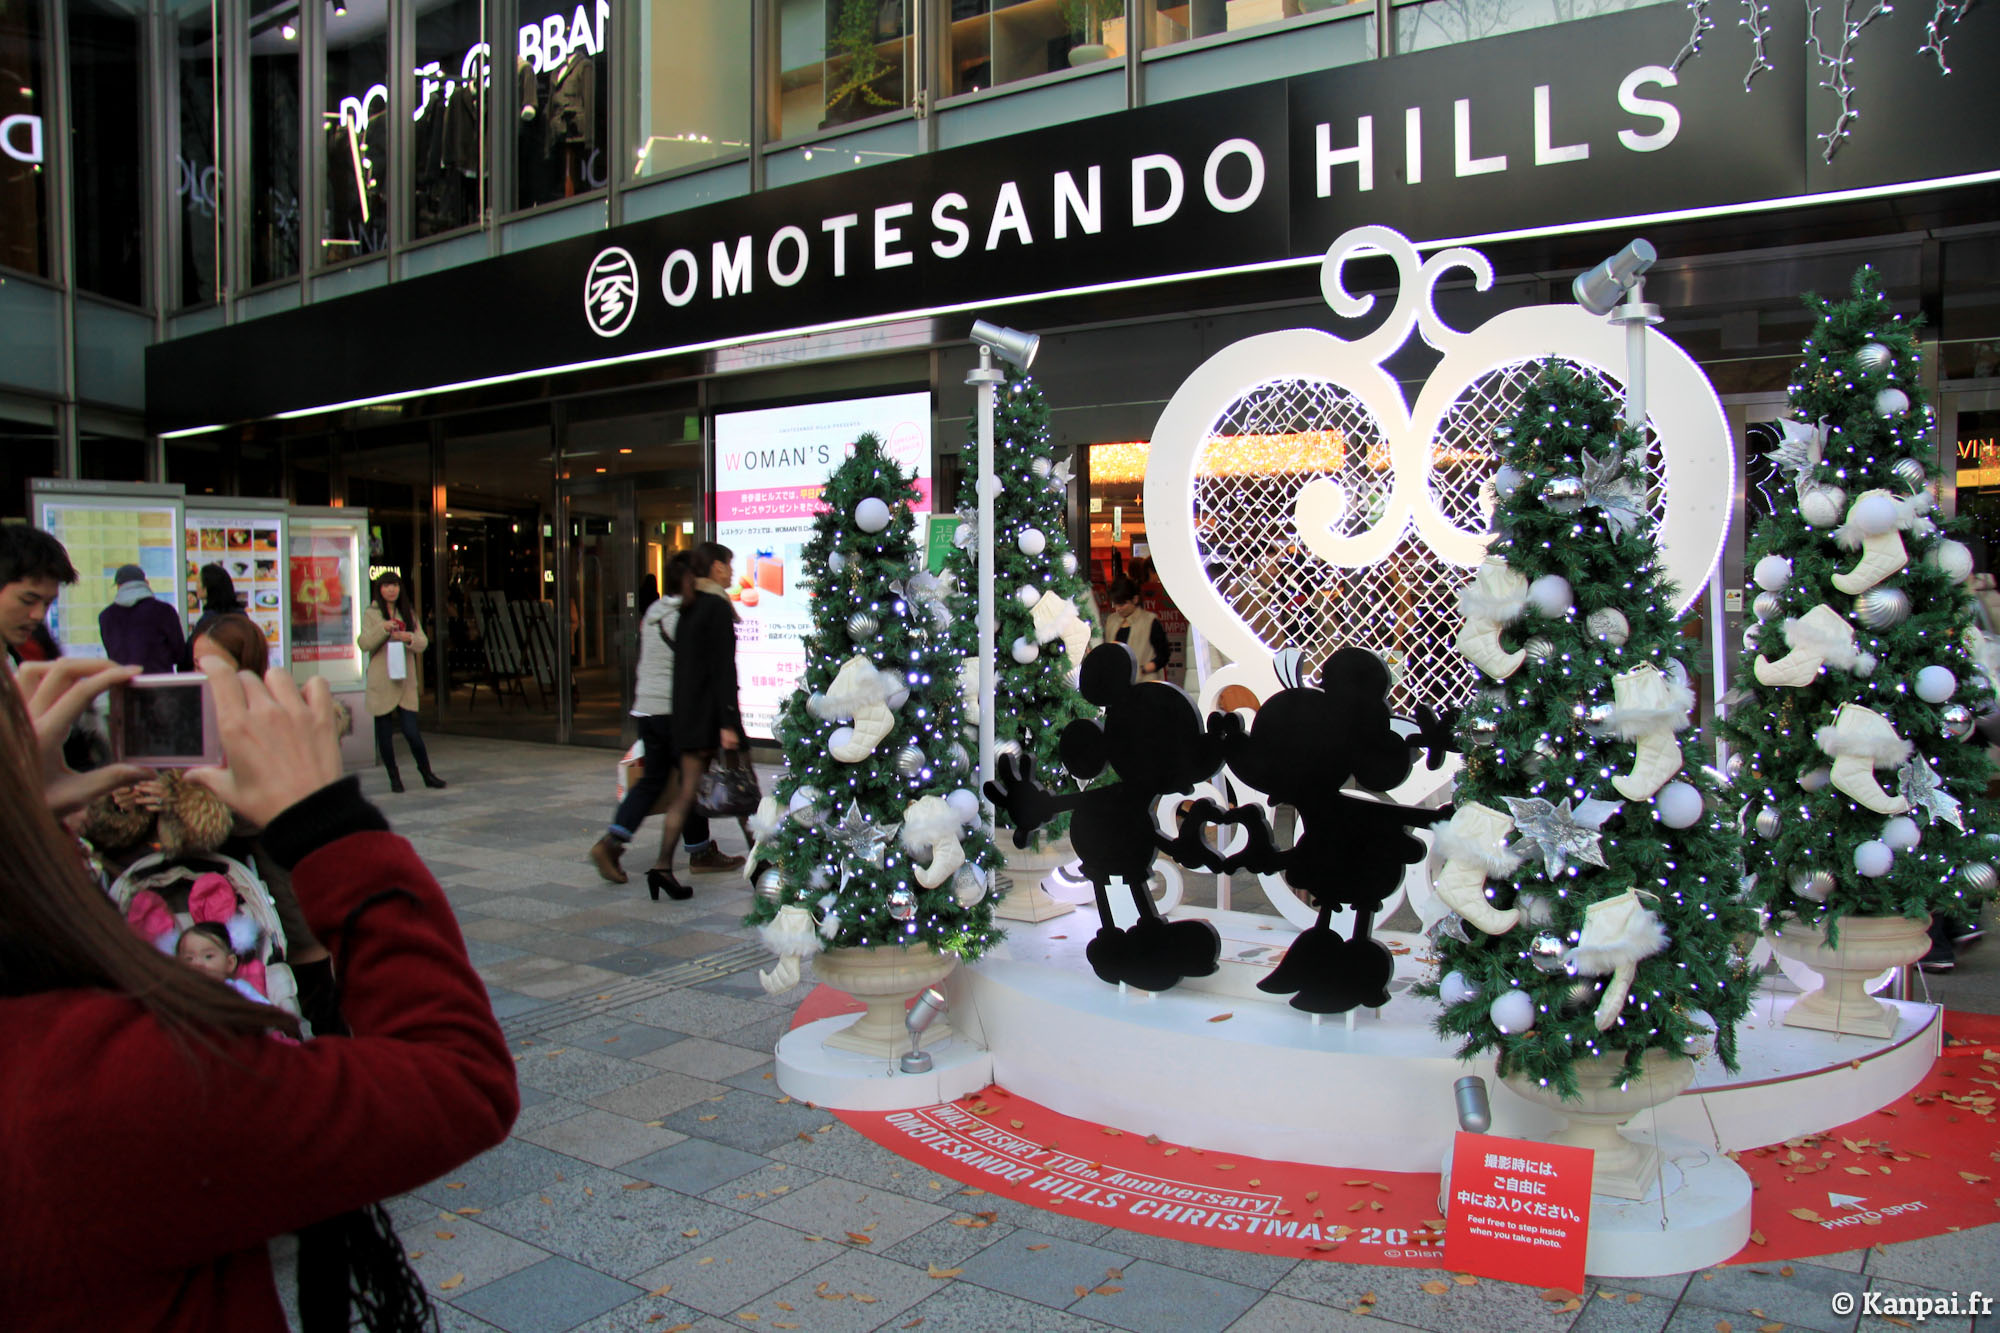 #9B3031 Tokyo à Noël 5327 decorations de noel au japon 2000x1333 px @ aertt.com